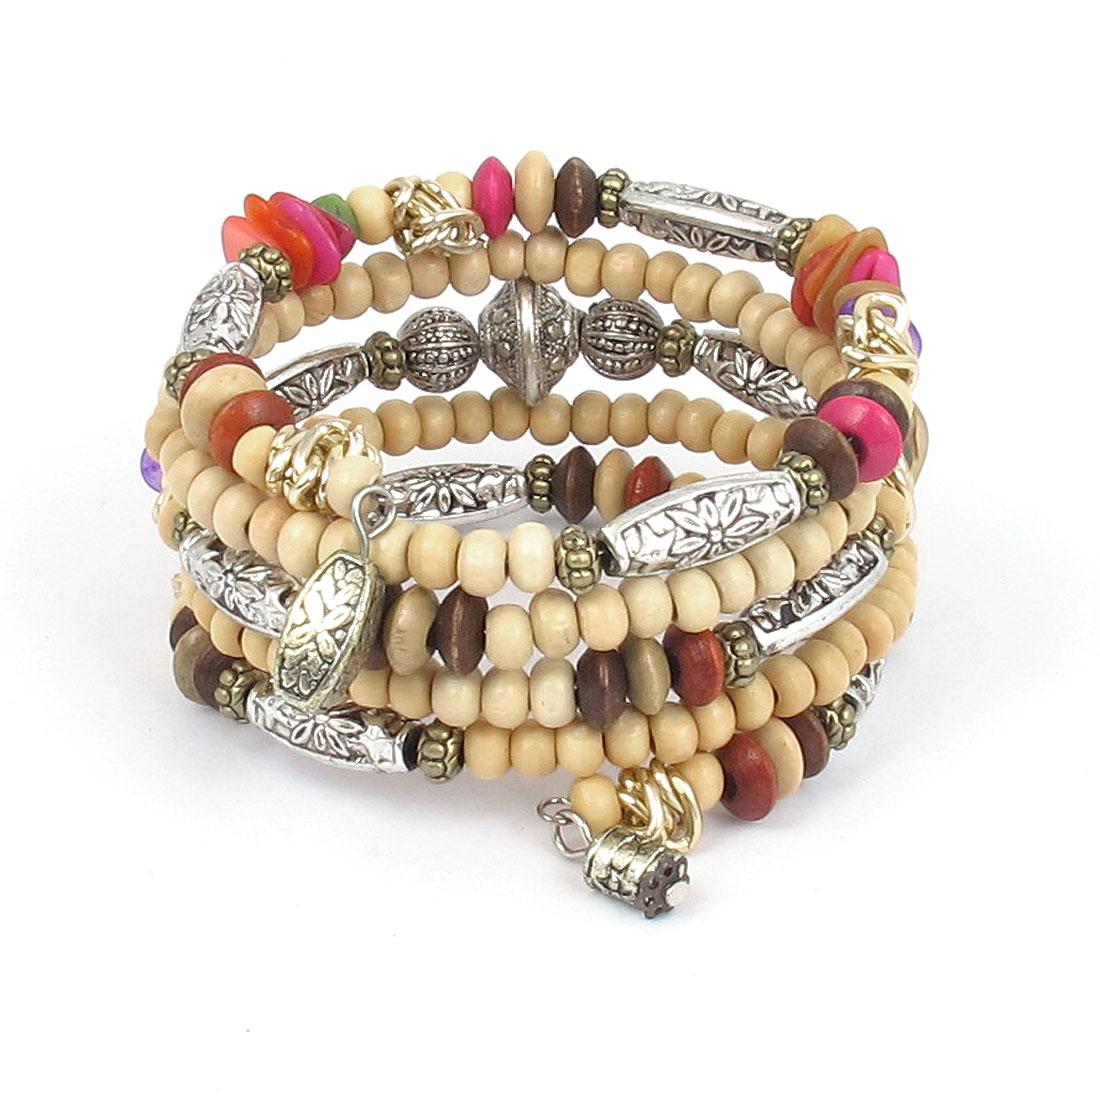 Lady National Style Handmade Wooden Beads Multi-layer Wrist Bangle Bracelet Beige